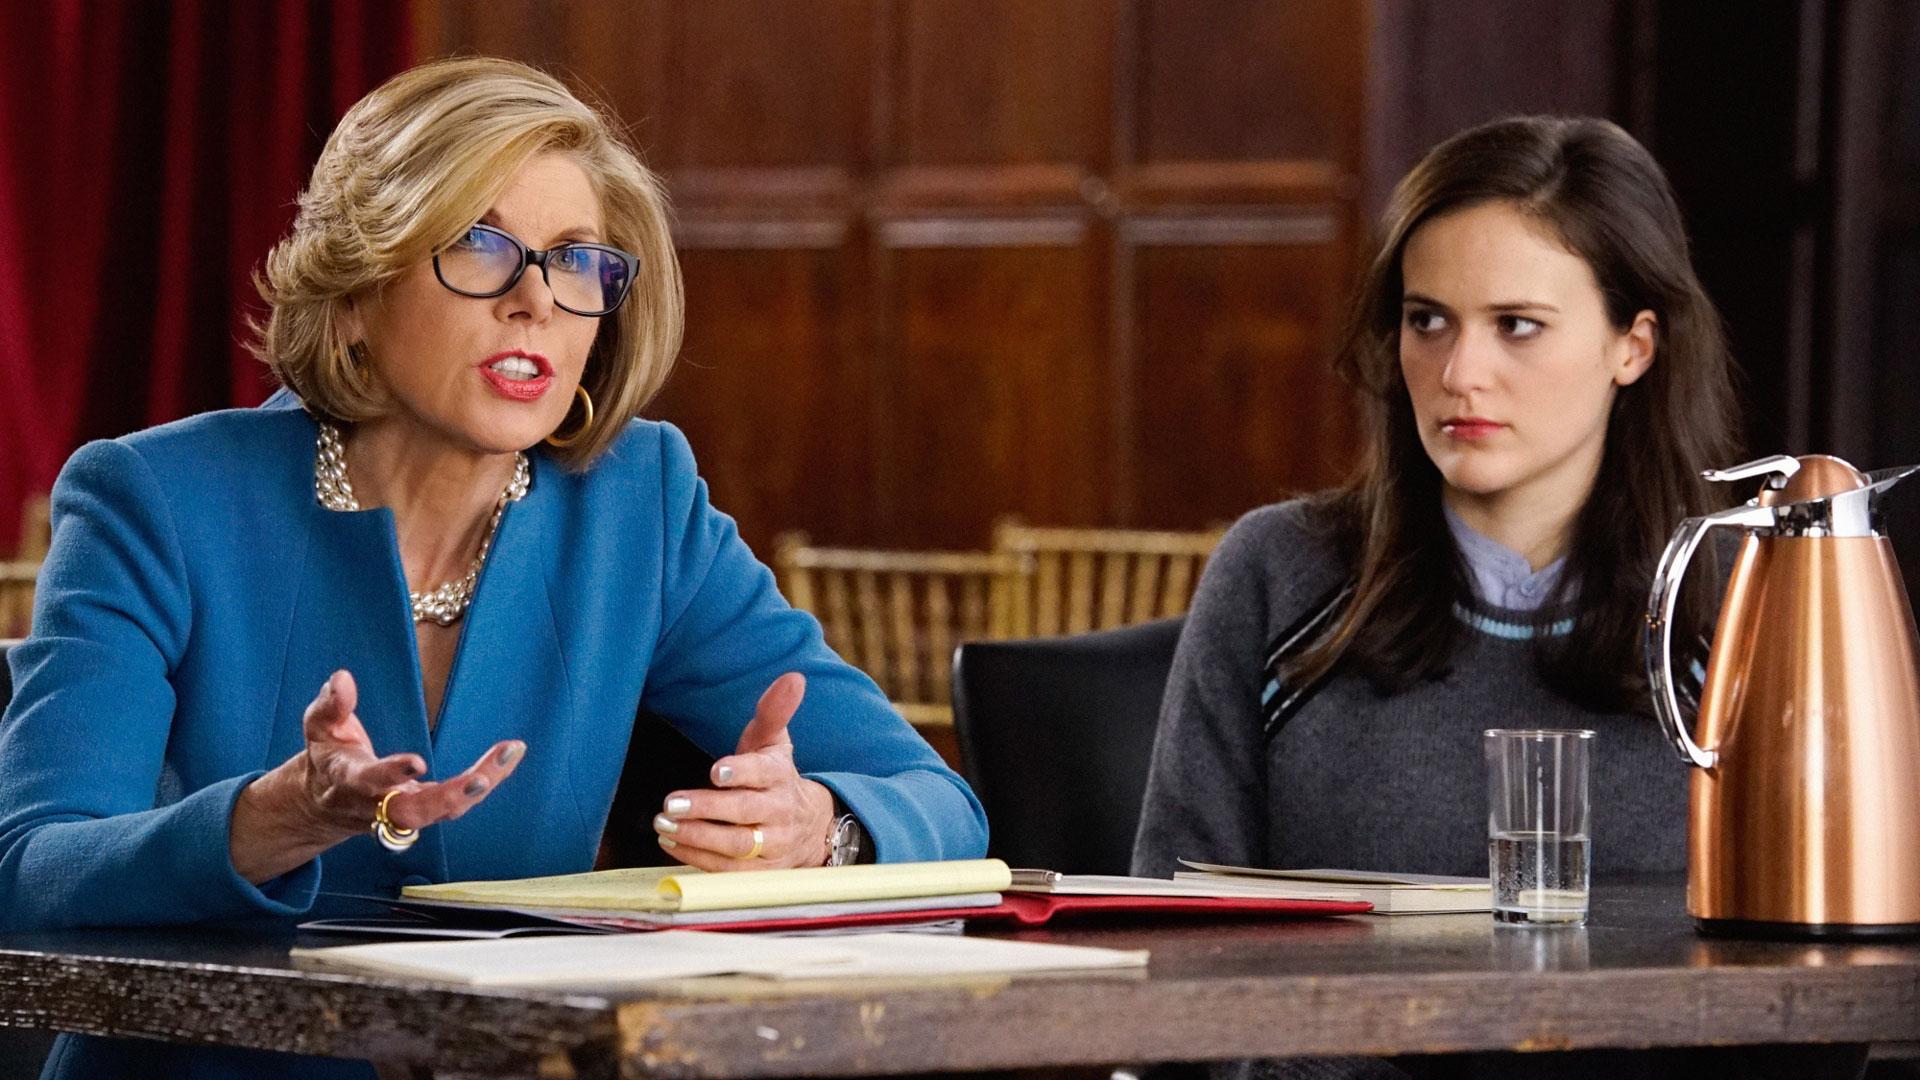 Christine Baranski as Diane Lockhart and Francesca Carpanini as Imogen Stowe